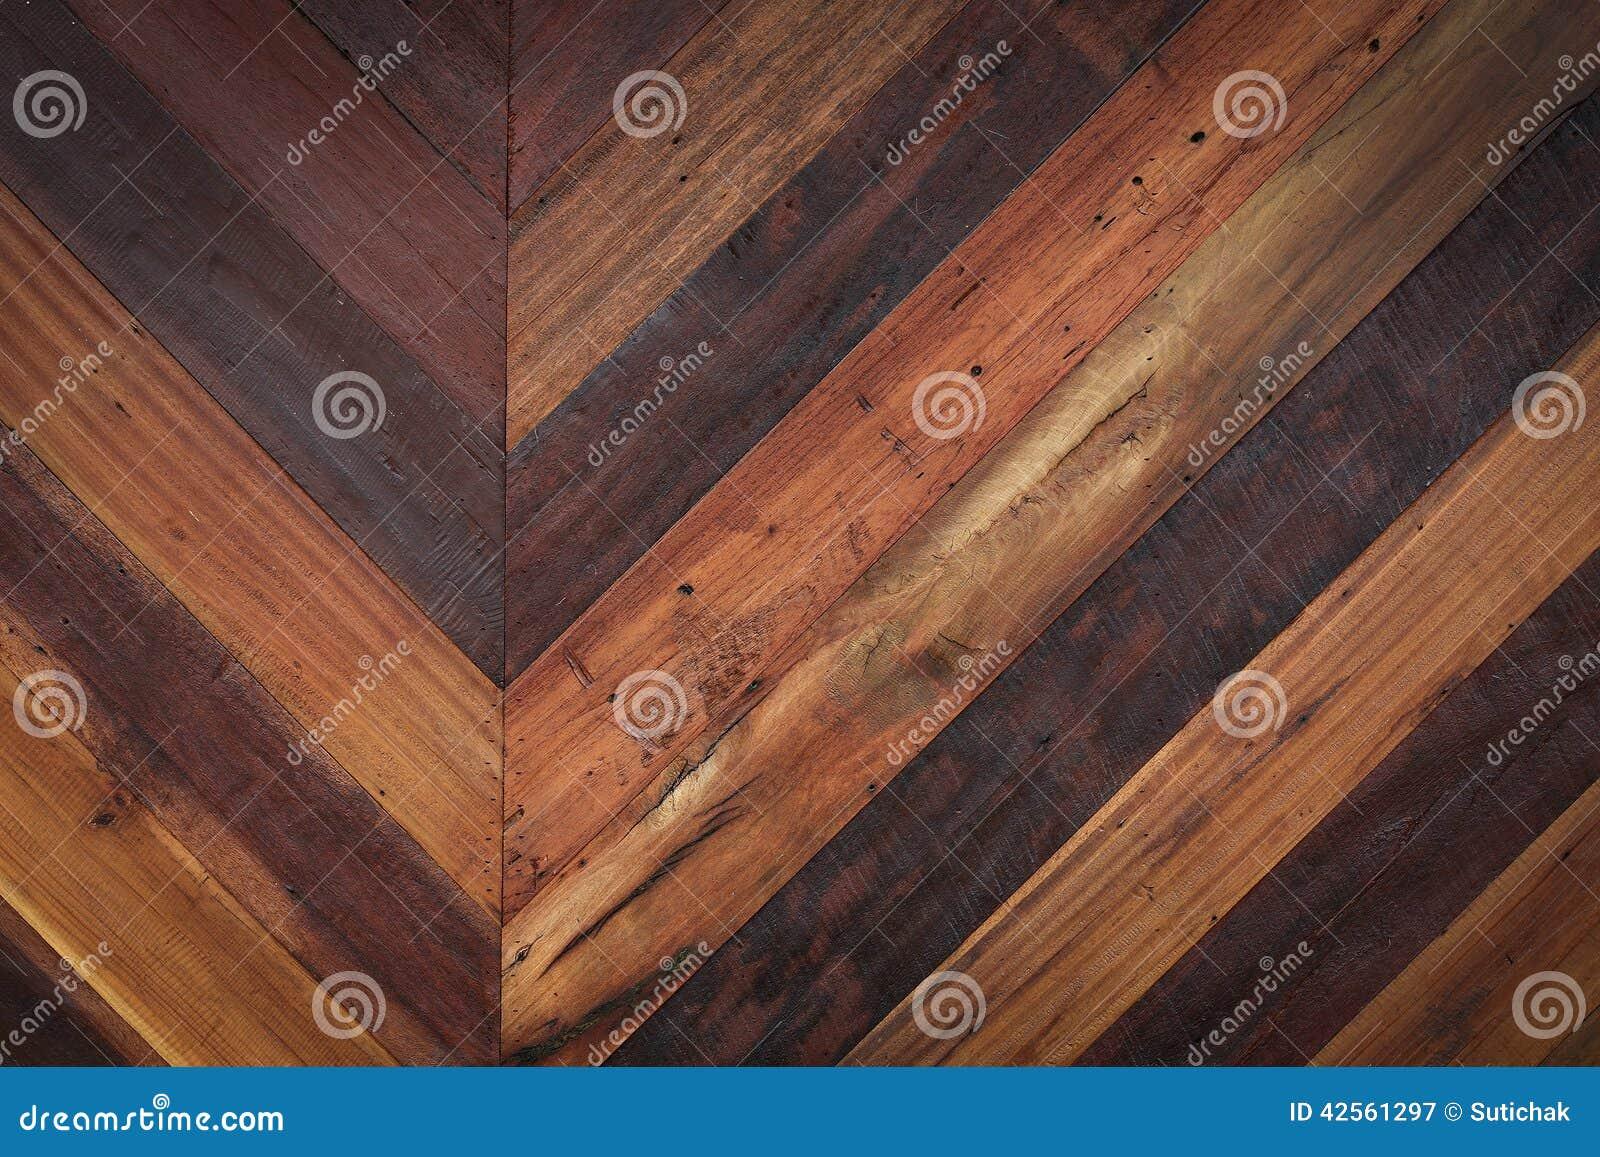 Wood brown texture